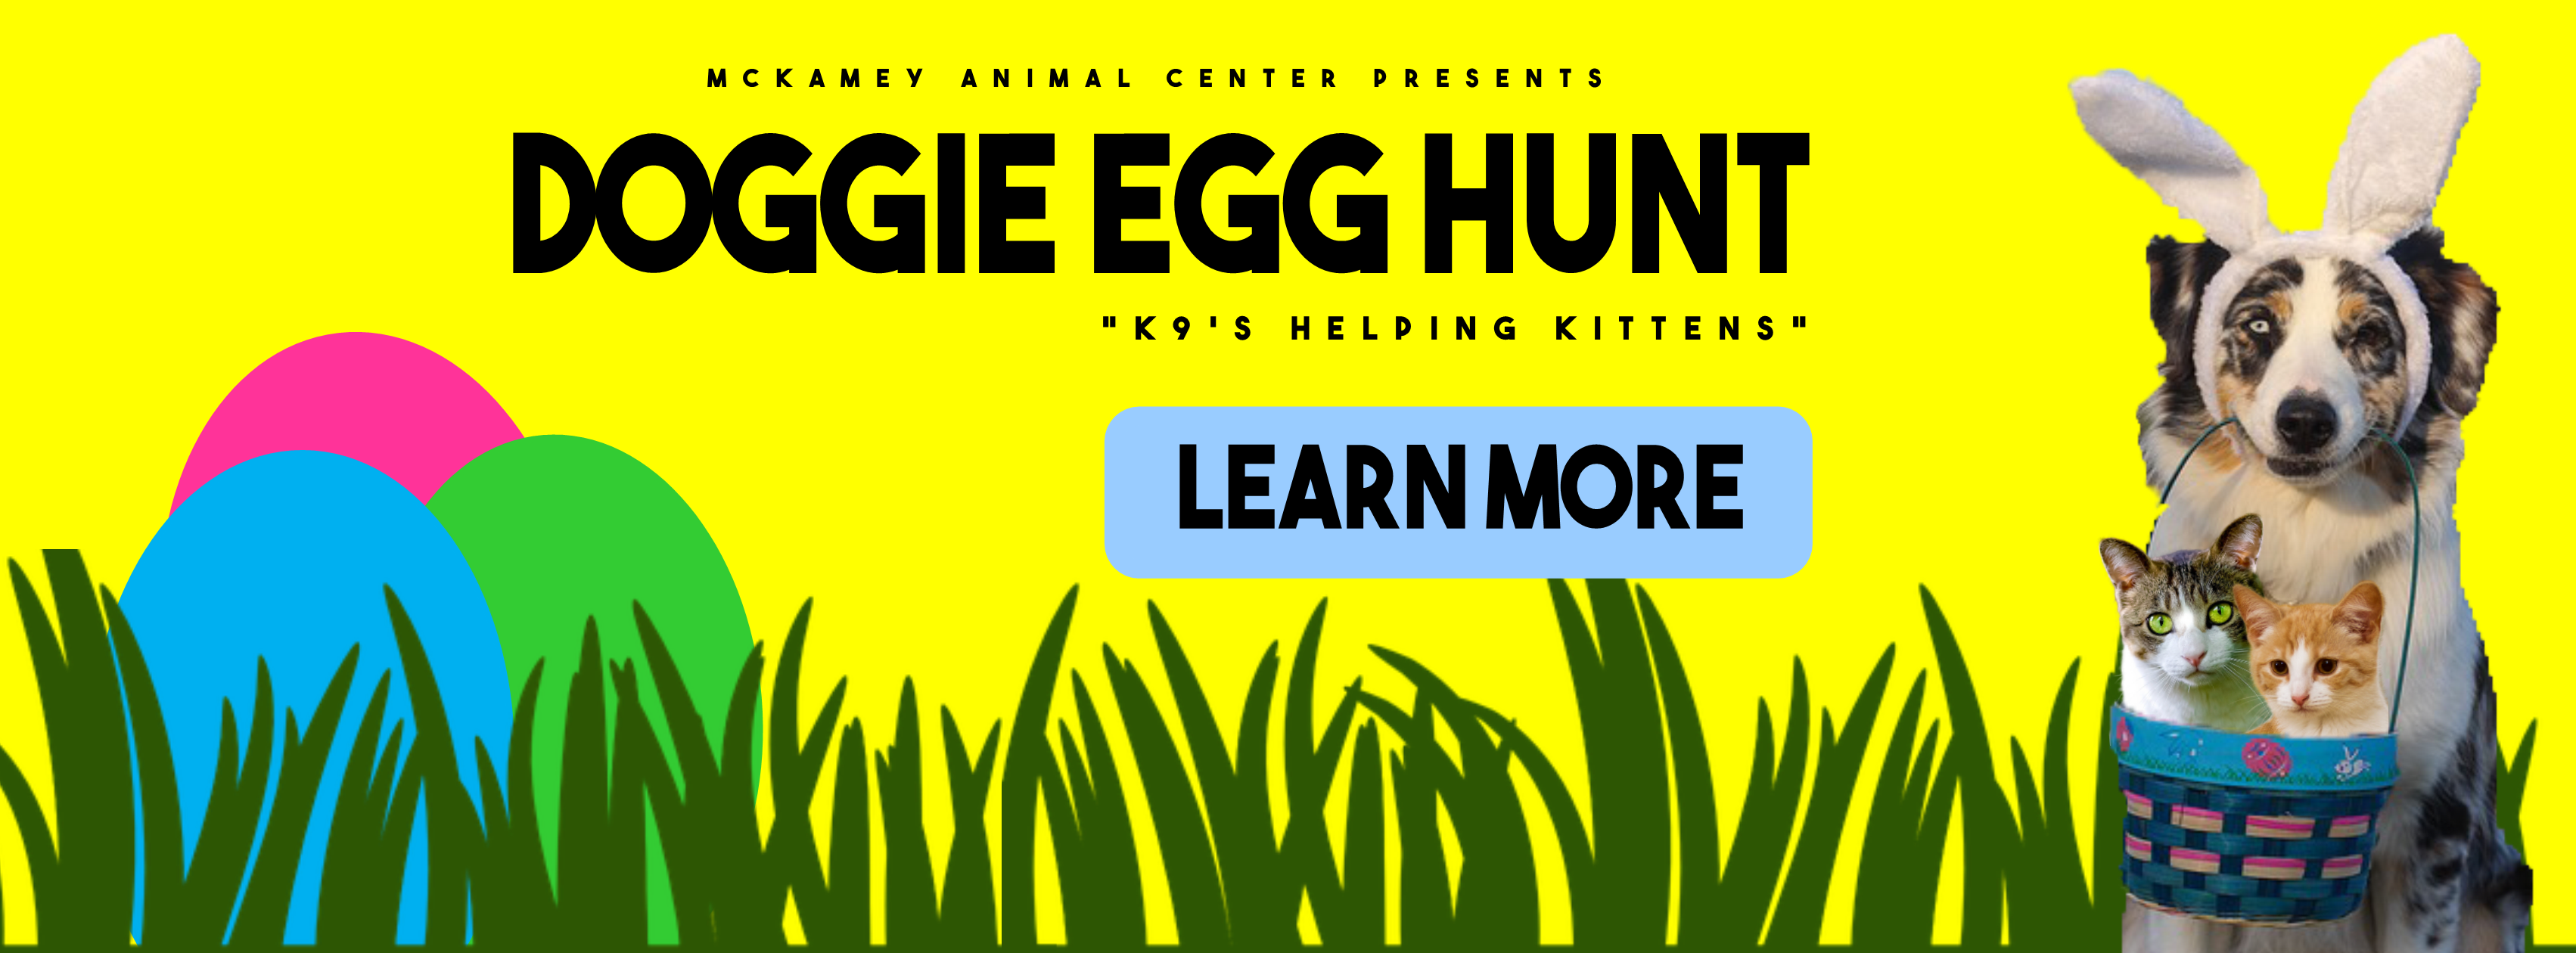 Doggie Egg Hunt Cover Photo Website.png